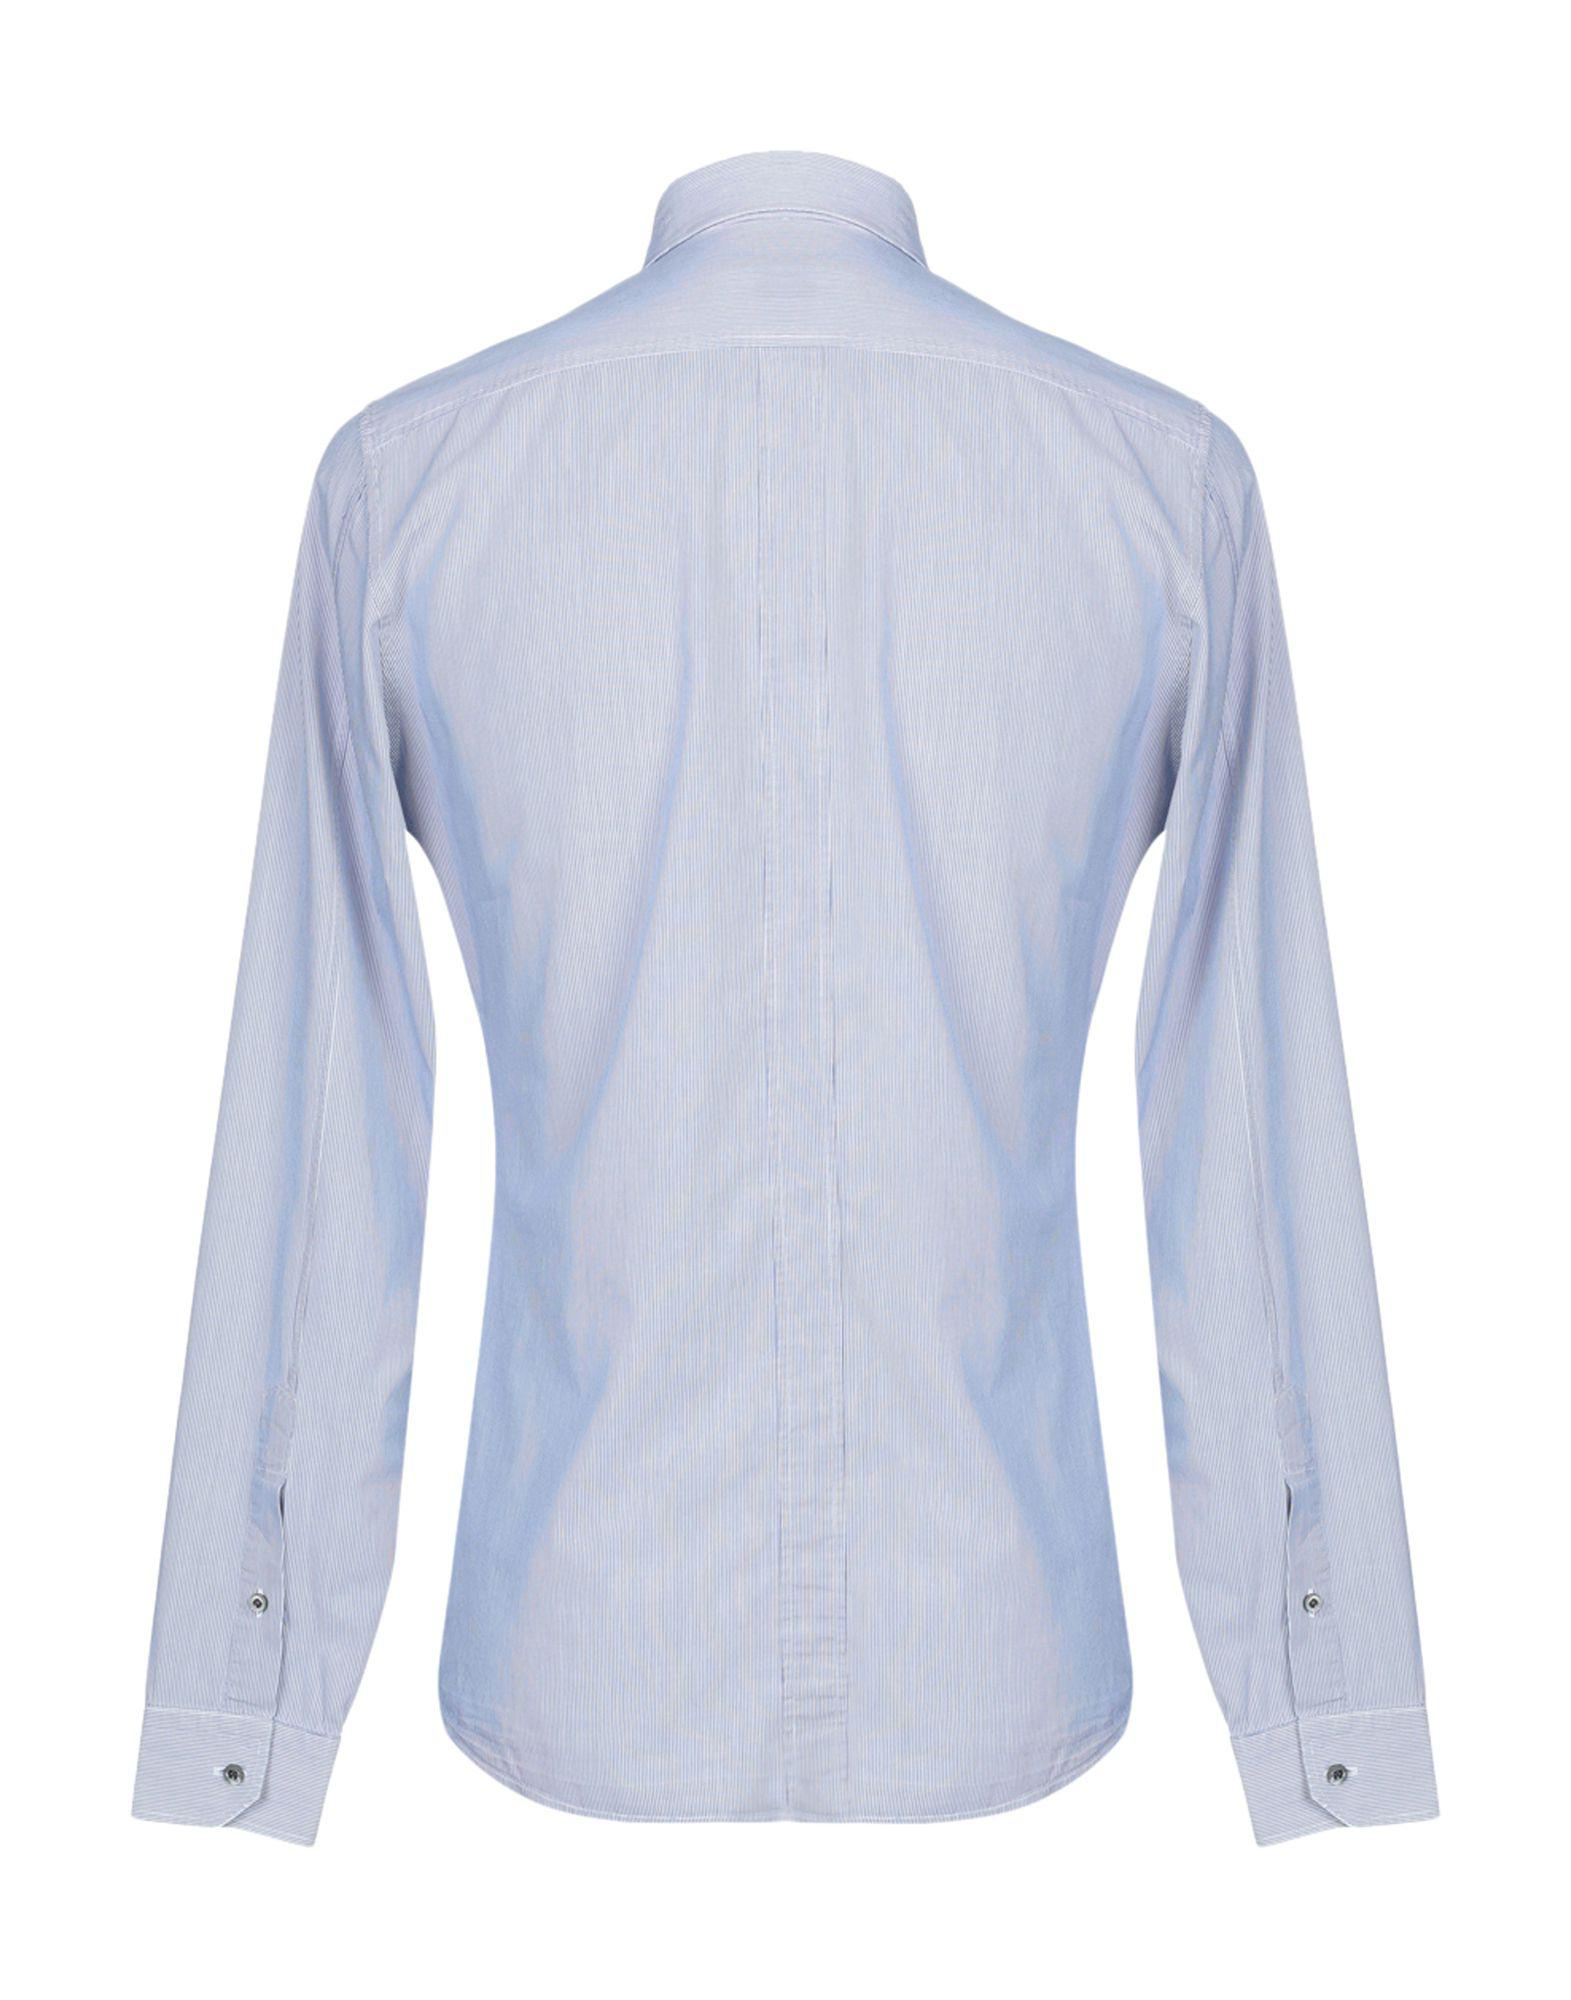 da3e6080aac9 Lyst - Gucci Shirt in Blue for Men